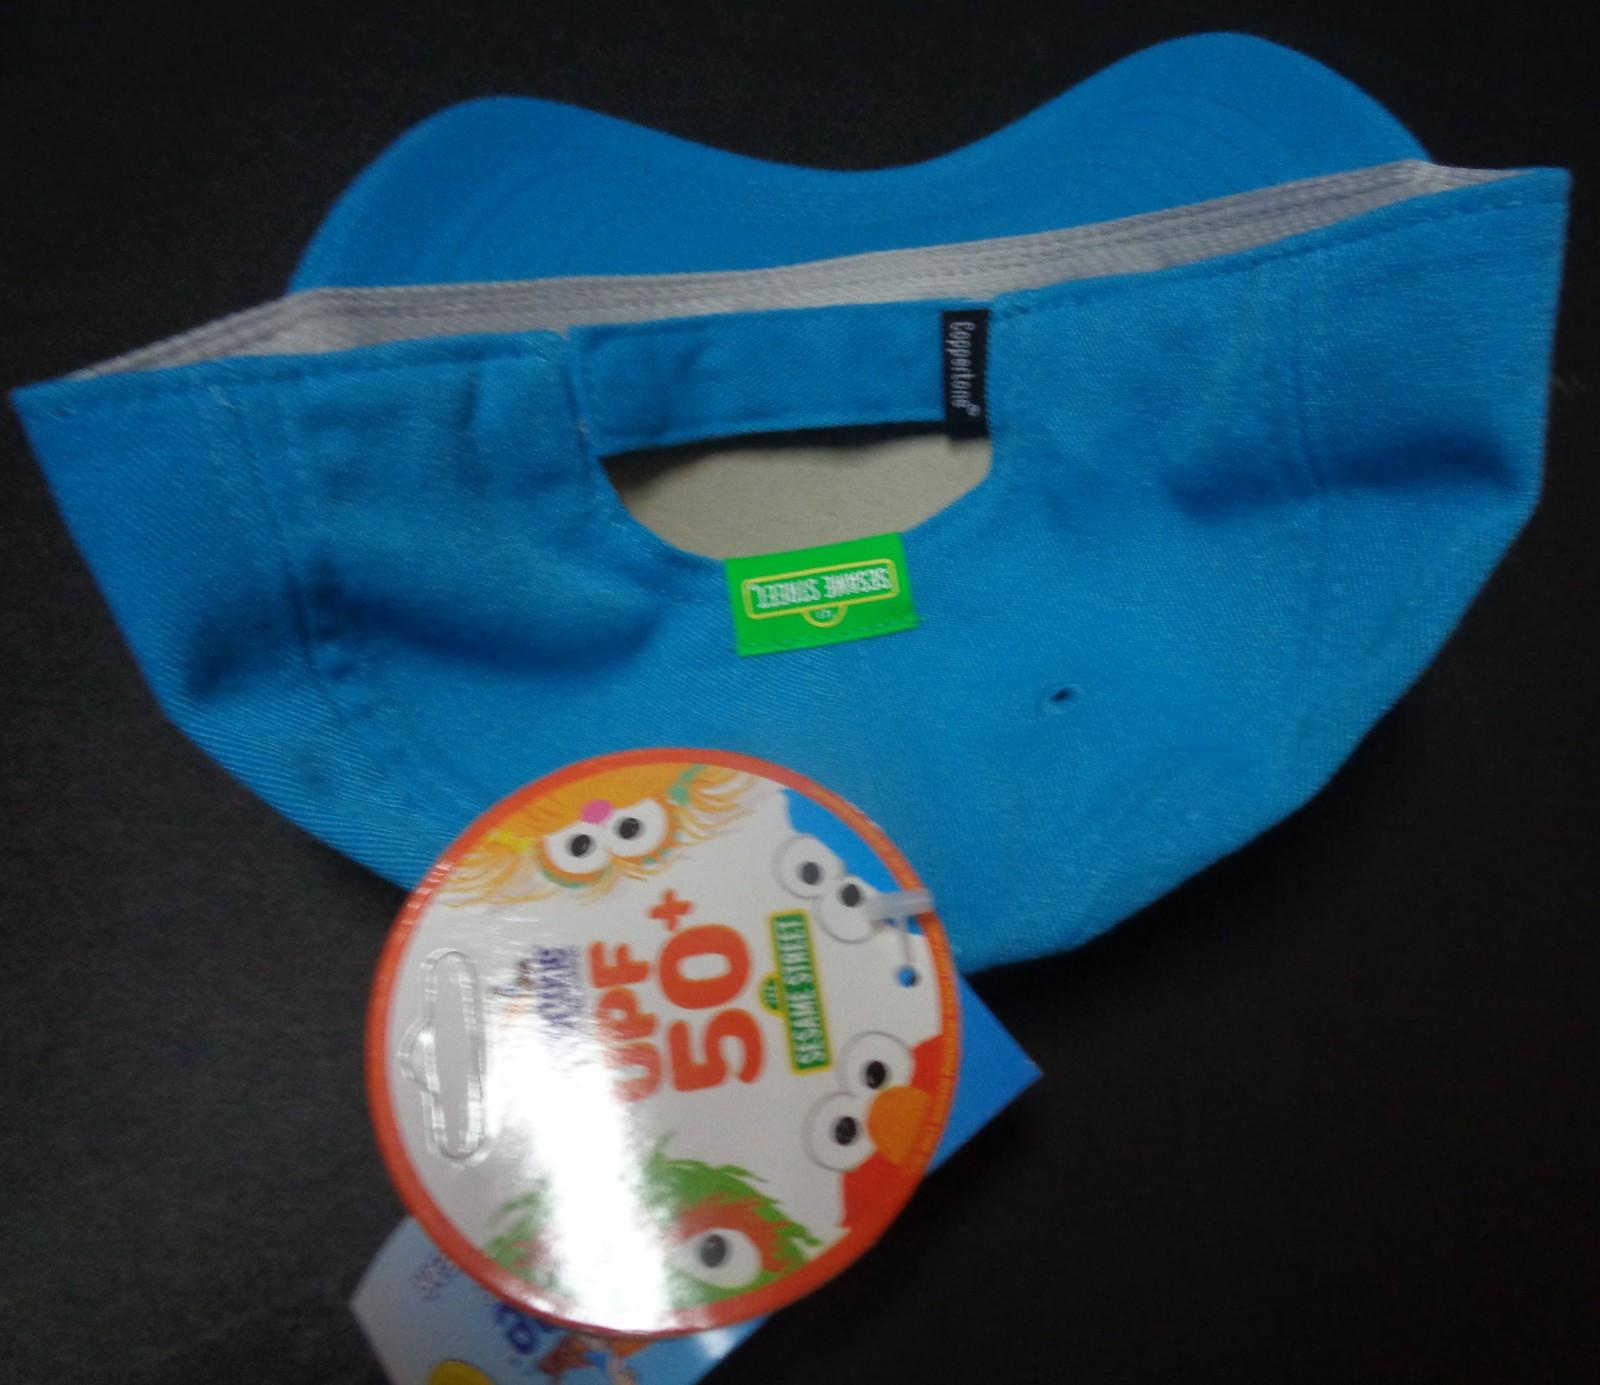 Sesame Street Cookie Monster Hat NWT Coppertone 50 UPF UV Protective Headwear